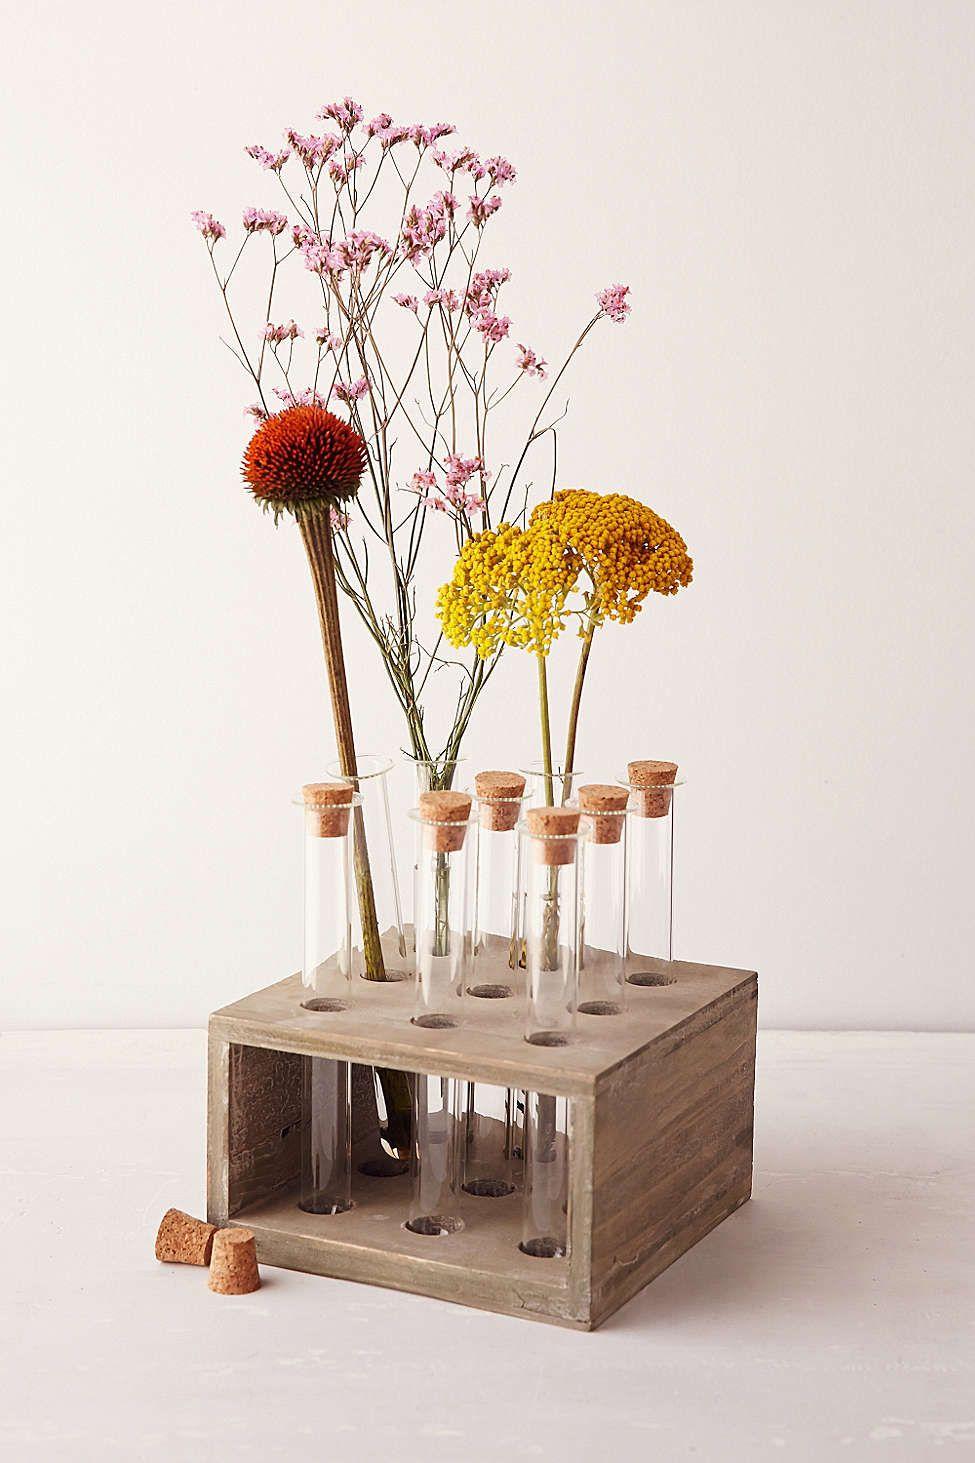 Test Tube Vase Urban Space Tube A Essai Fleurs Bois